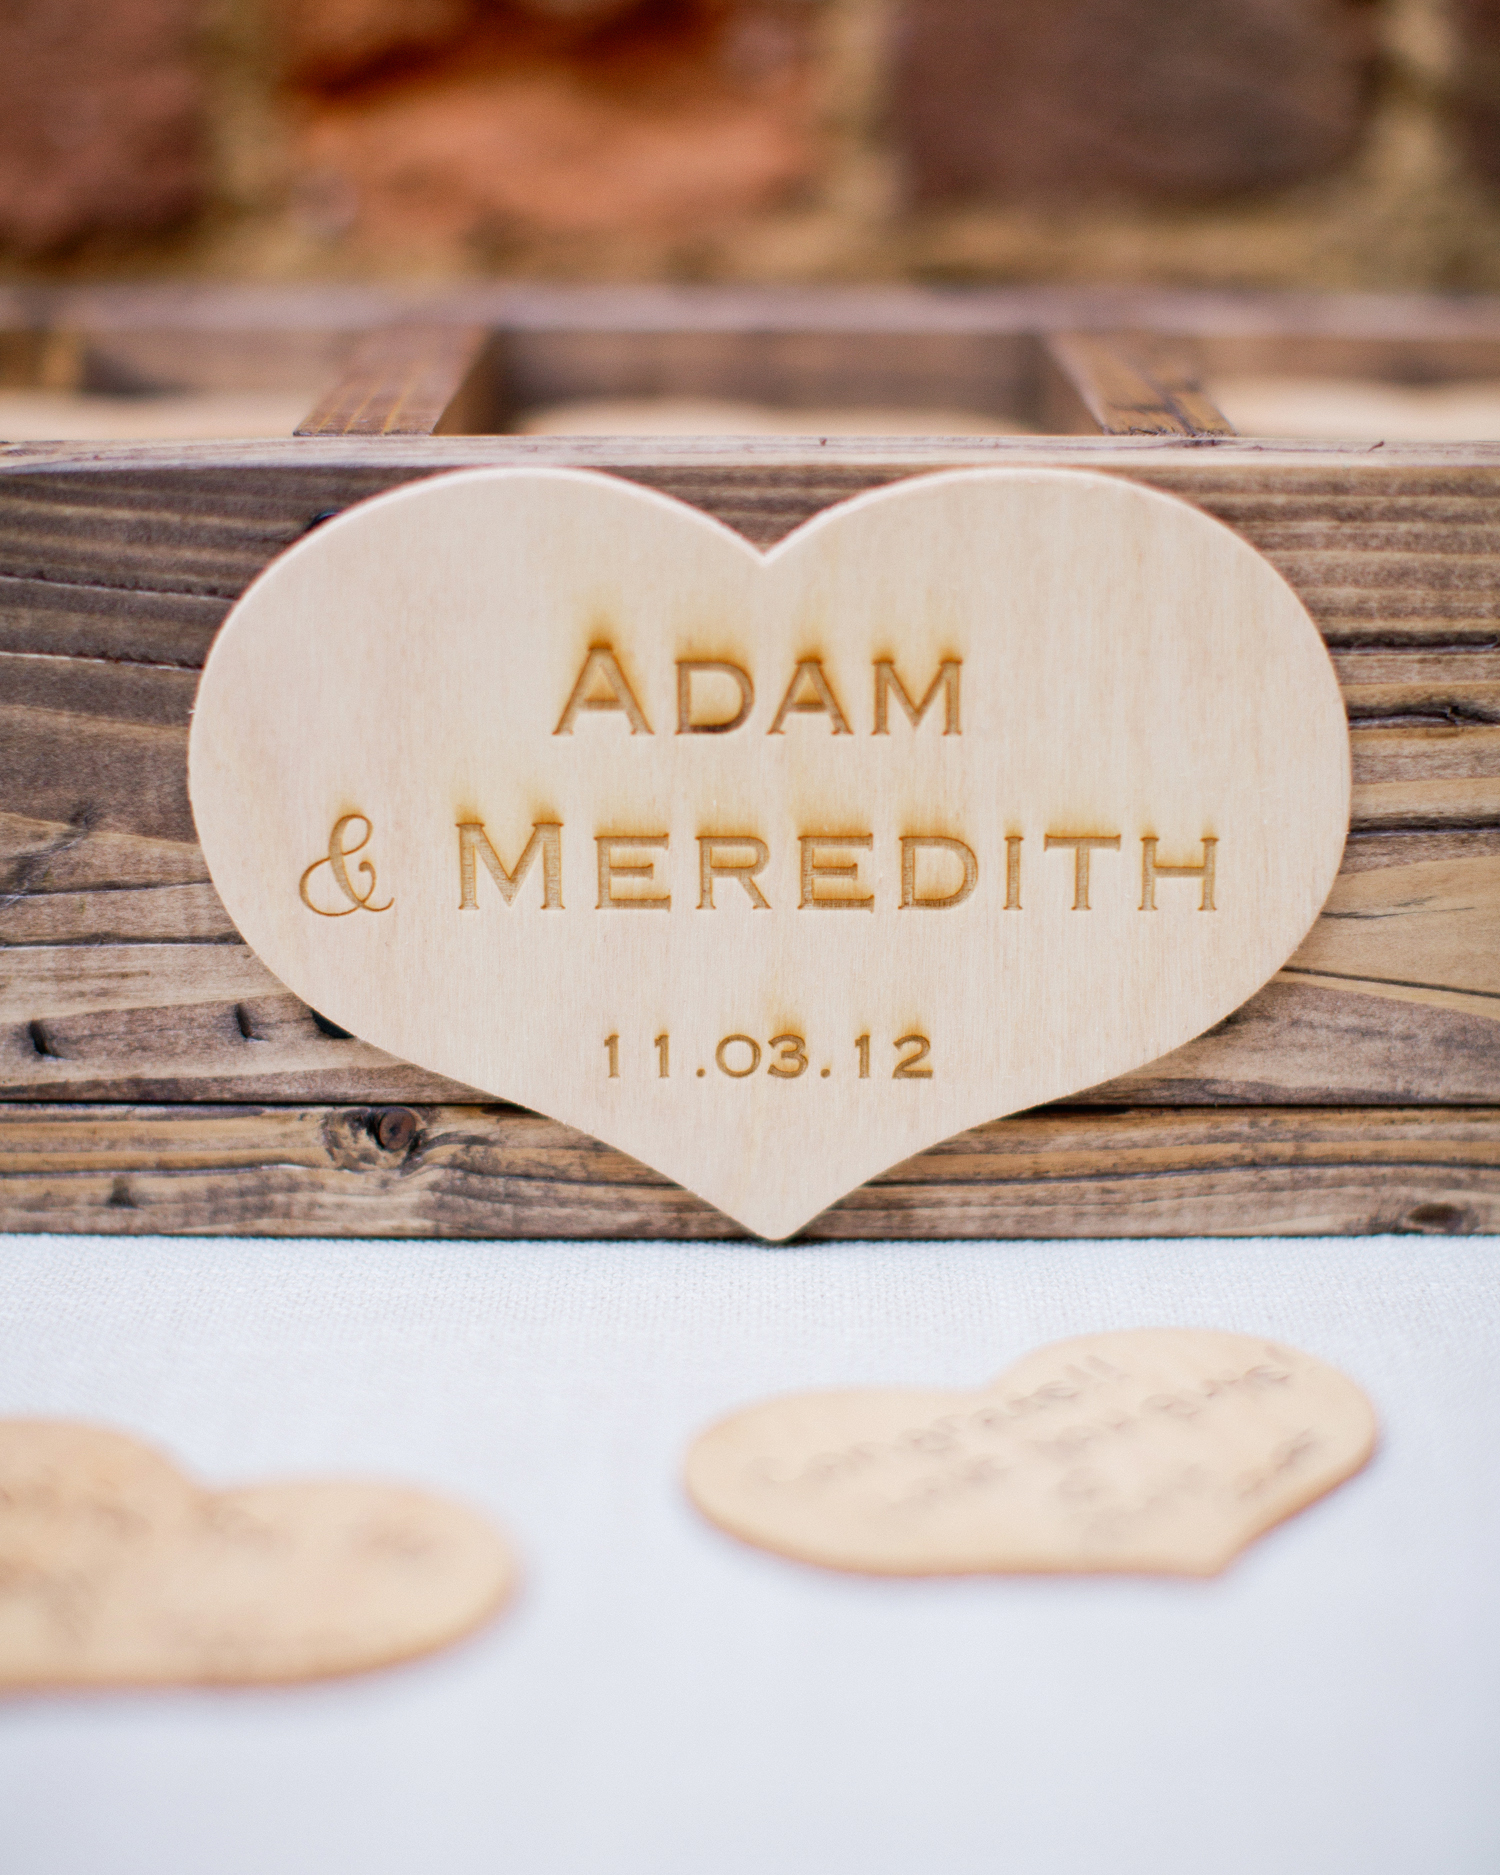 real-weddings-meredith-adam-harl3632.jpg